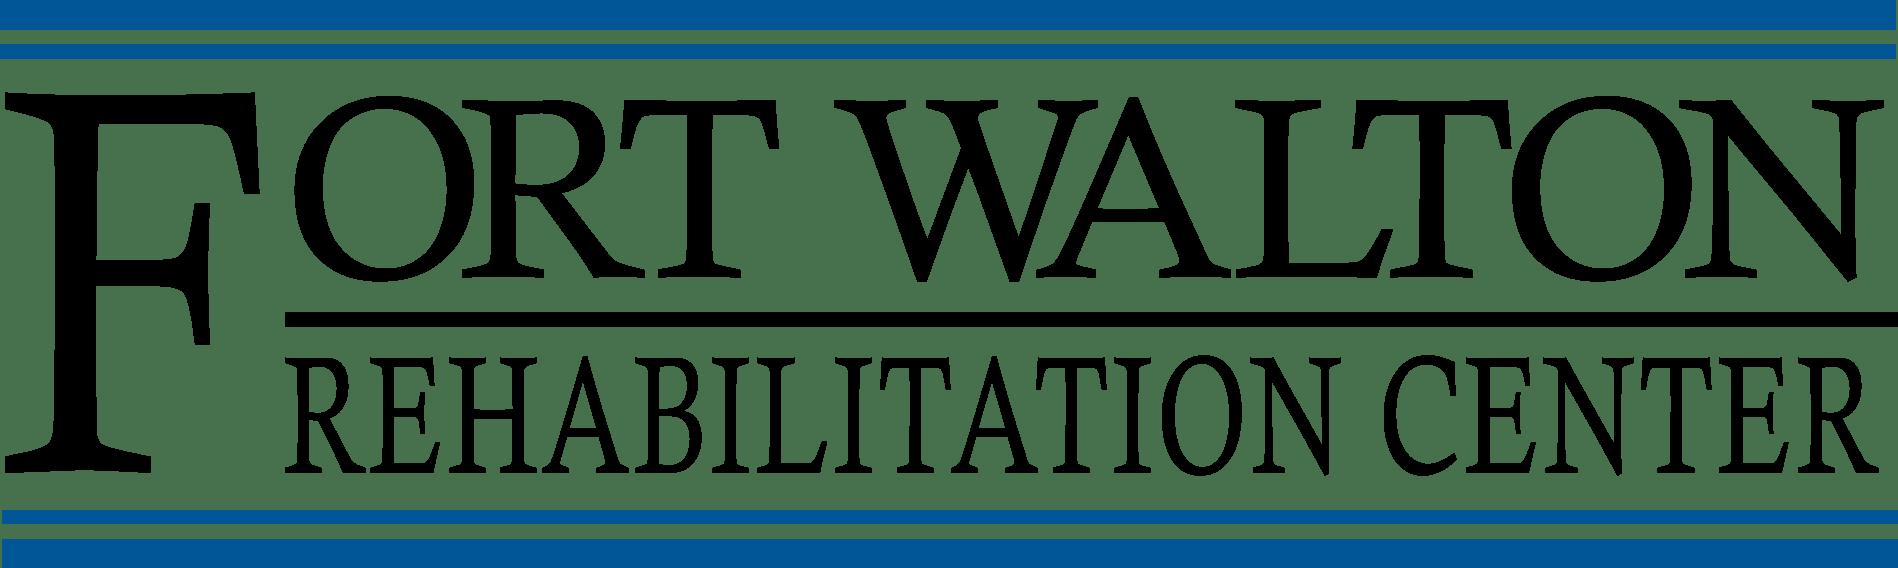 Fort Walton Rehabilitation Center logo